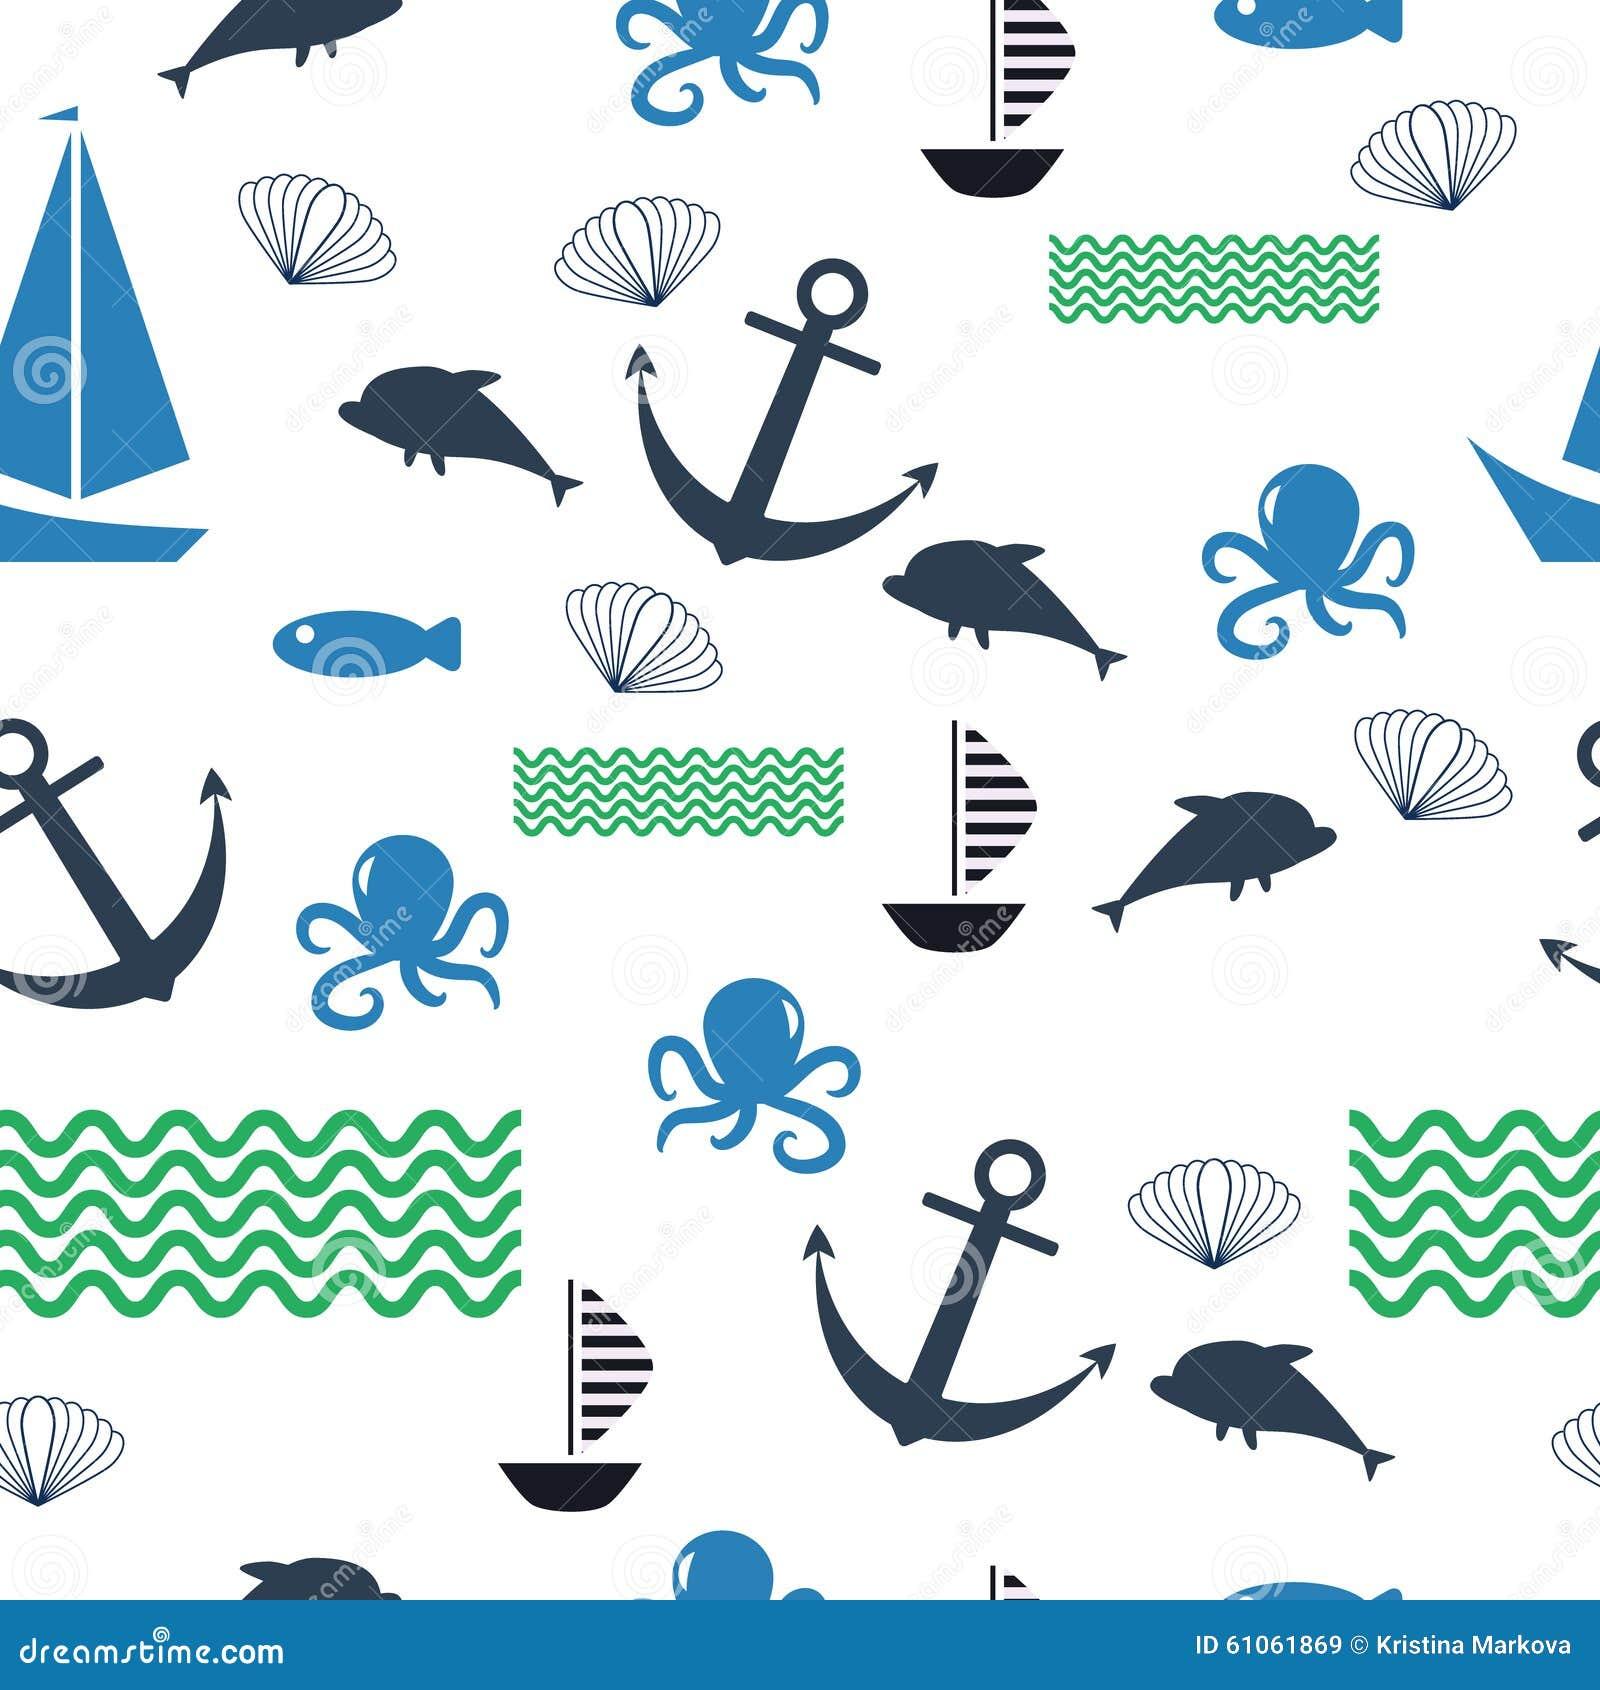 ocean fish wallpaper pattern - photo #6